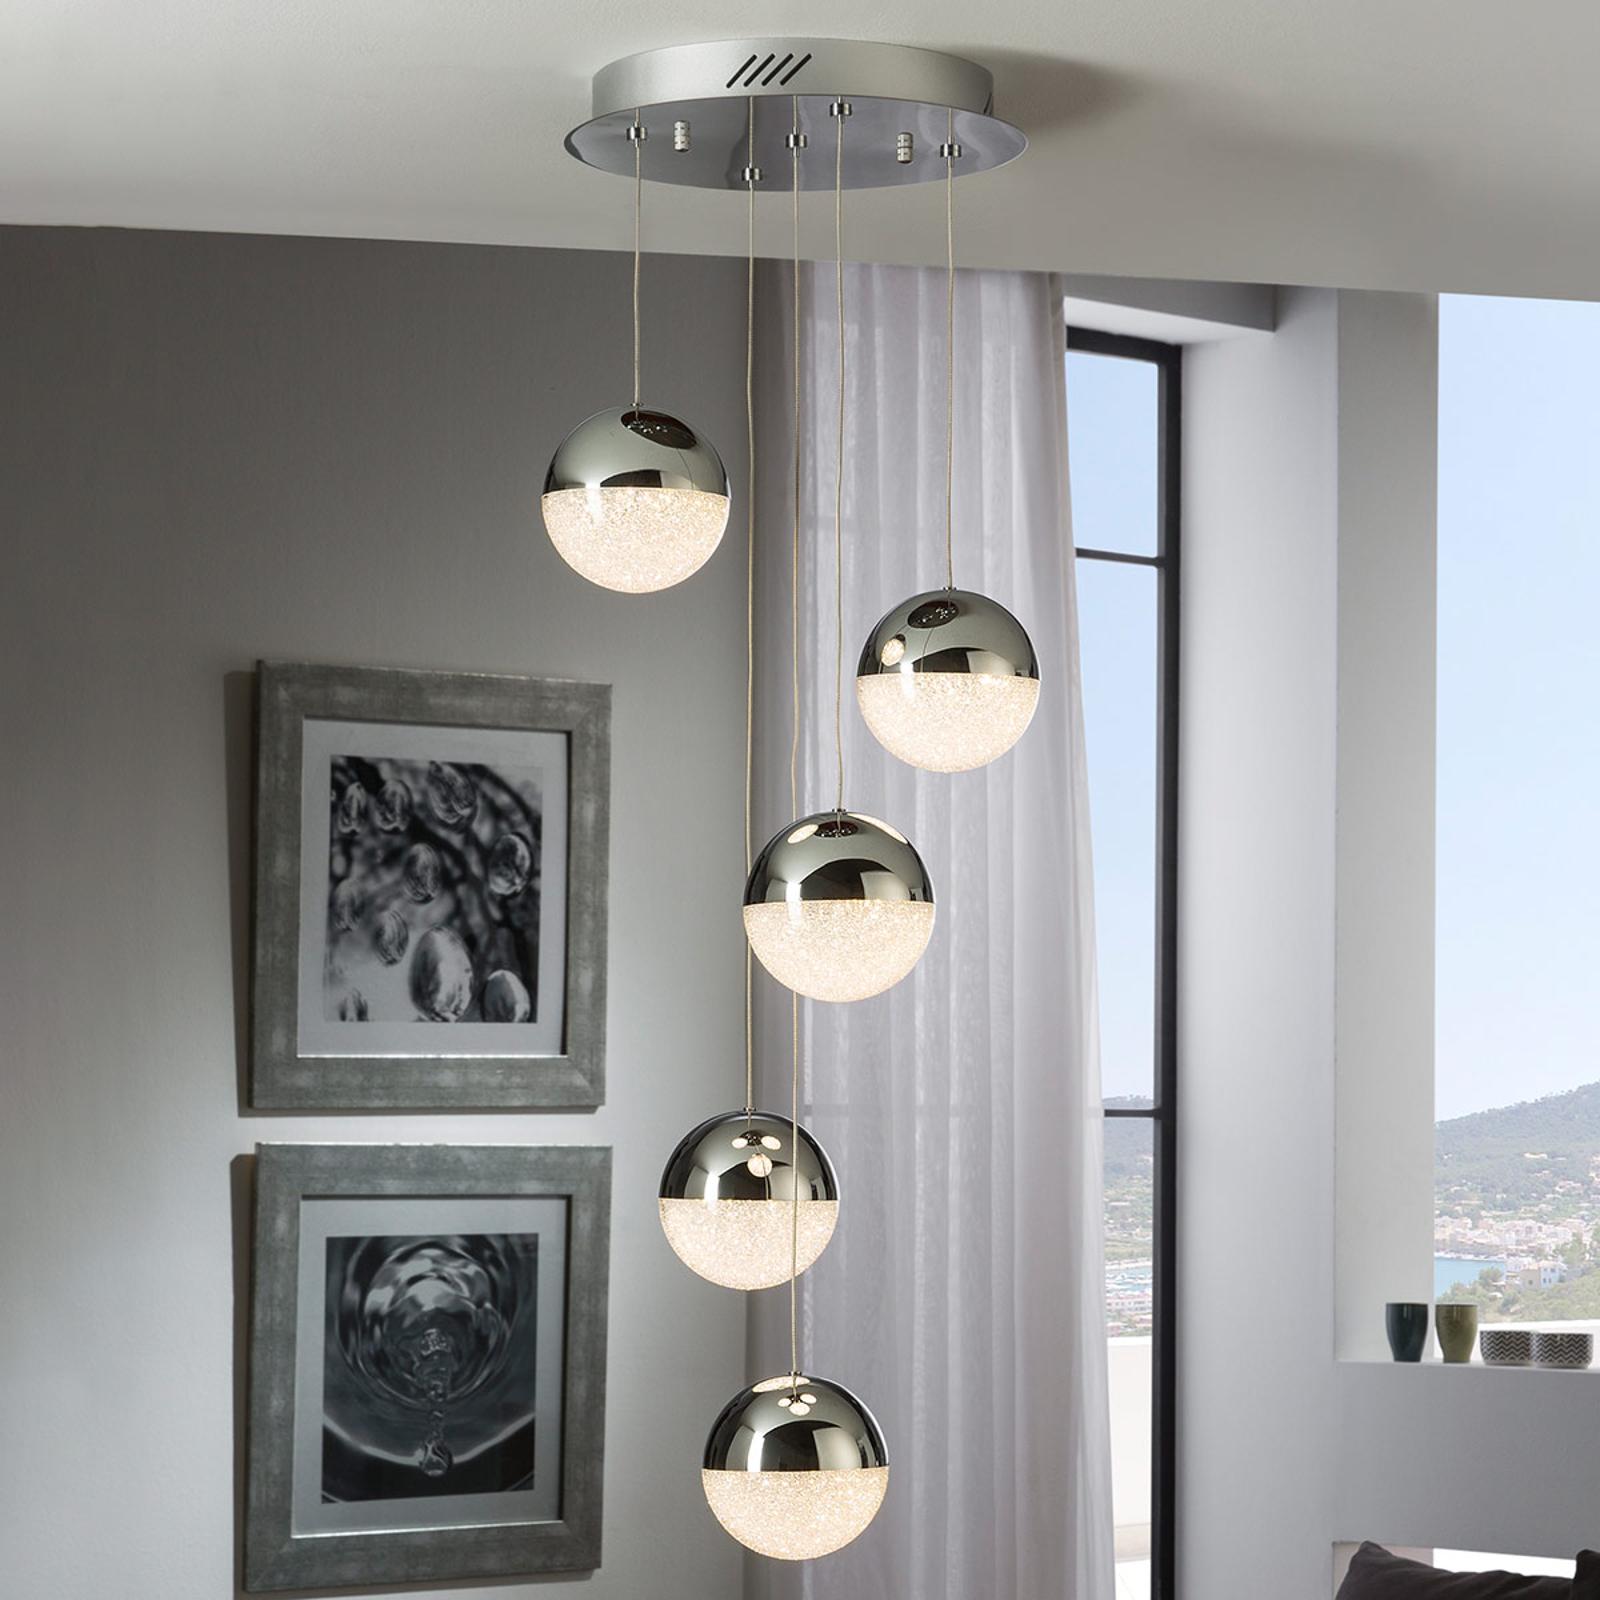 LED-Hängeleuchte Sphere, 5-flammig, chrom